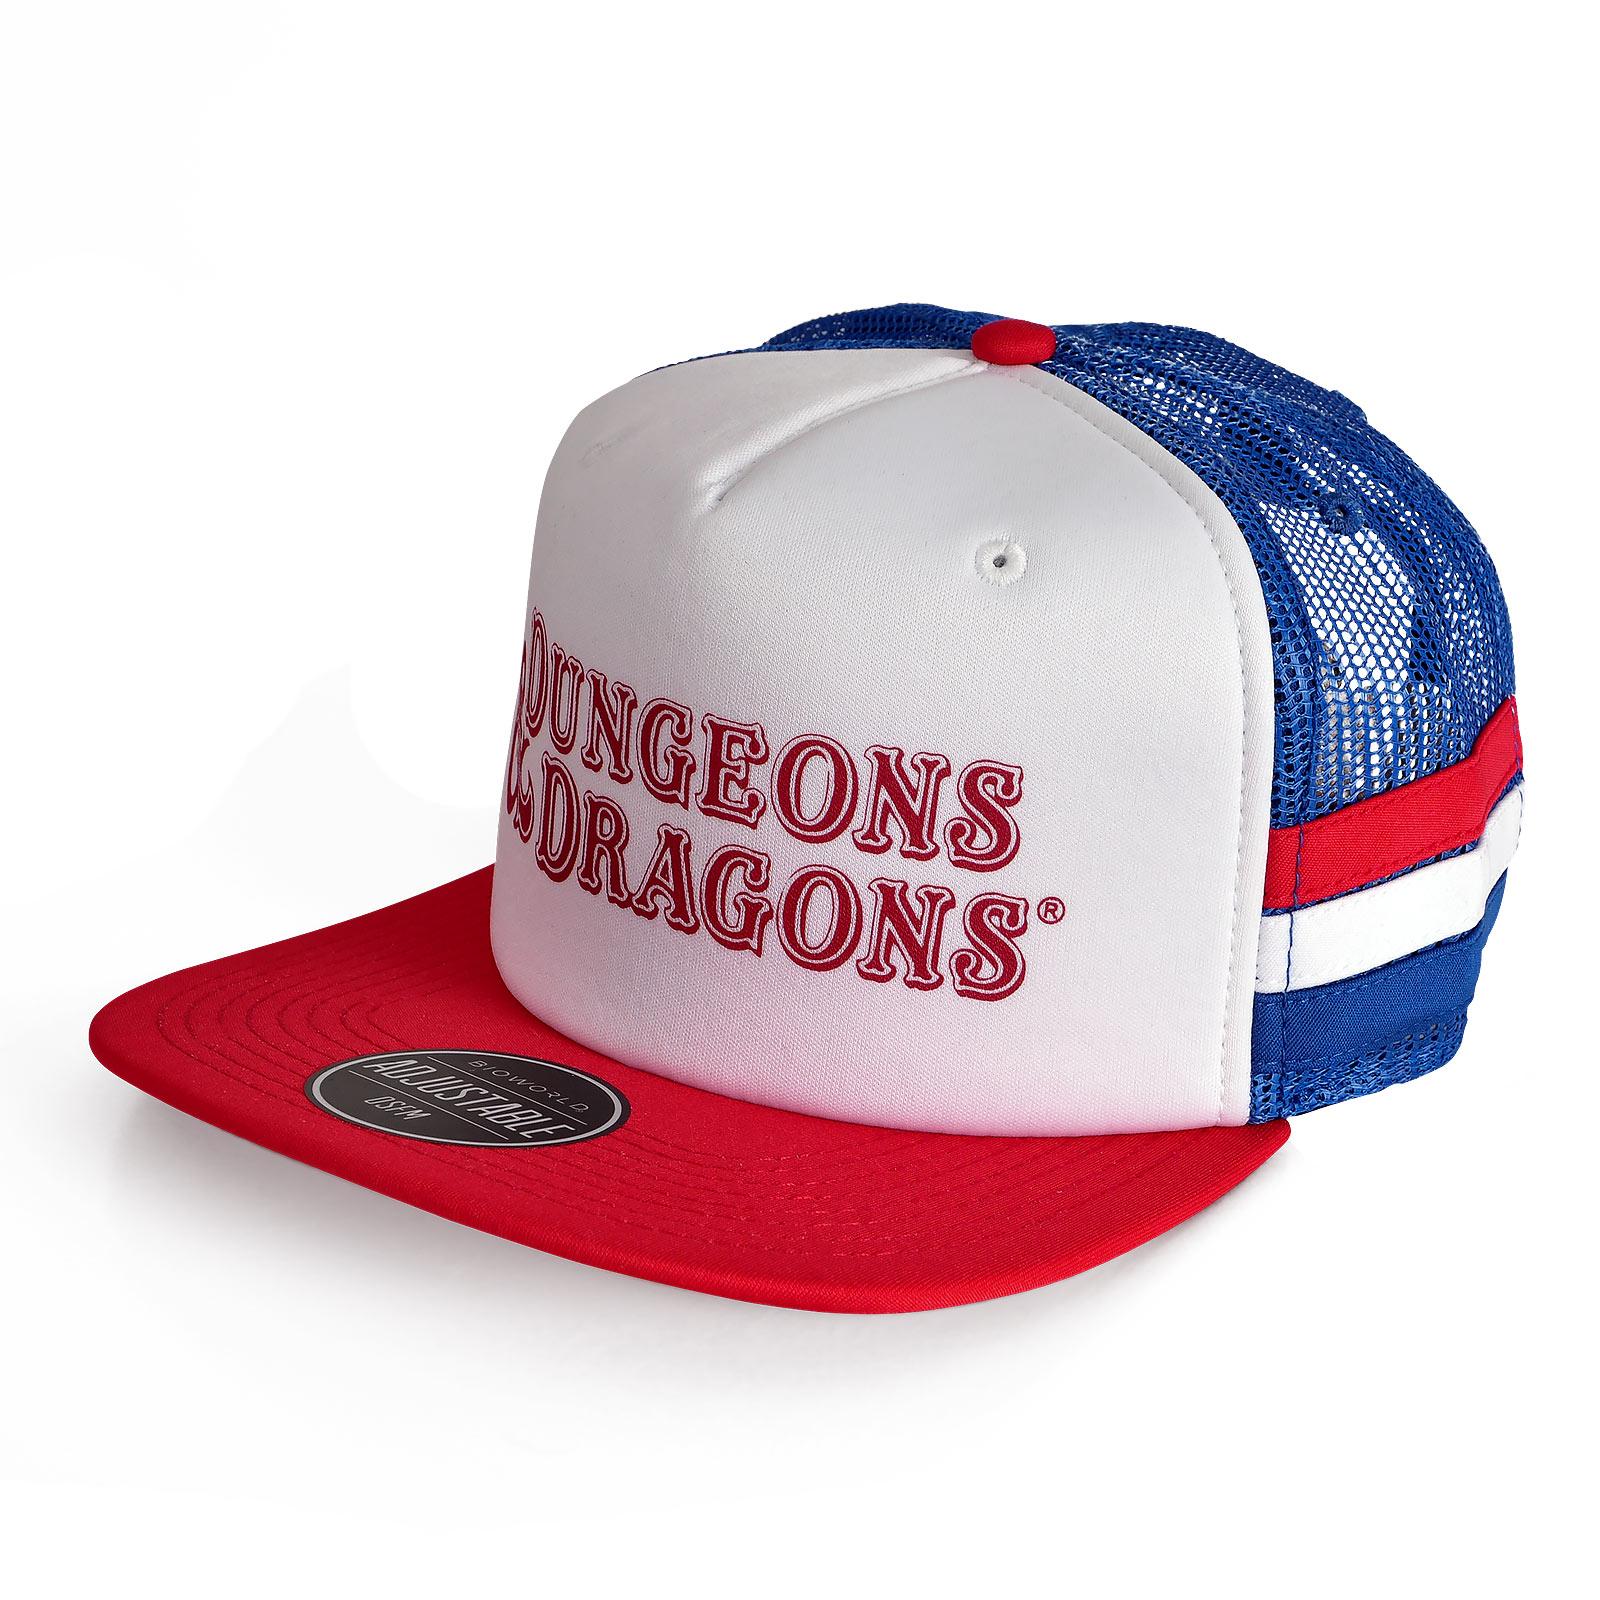 Dungeons & Dragons - Logo Snapback Cap